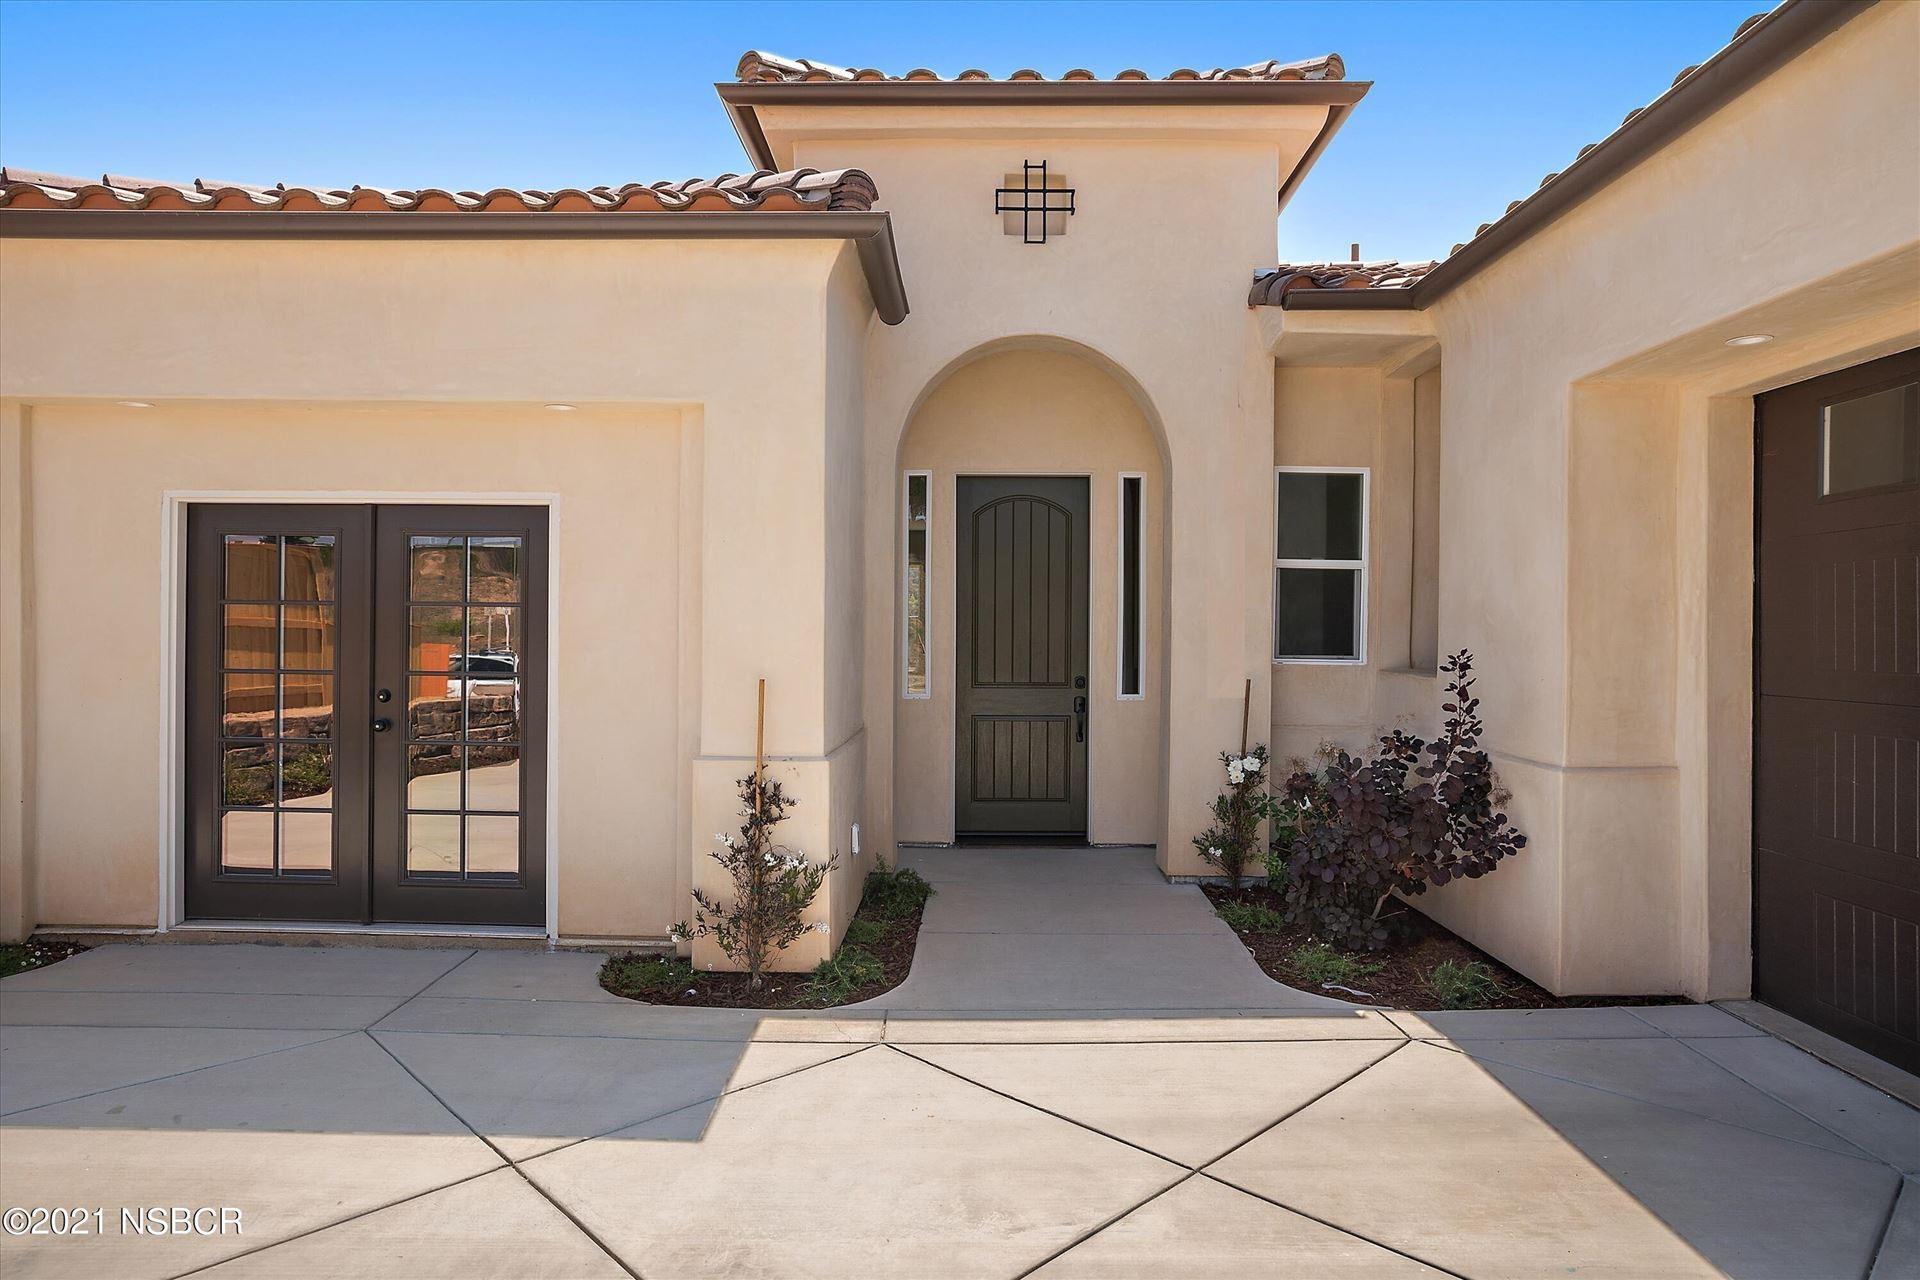 1618 Tuscan Way, Santa Maria, CA 93454 - MLS#: 21001353